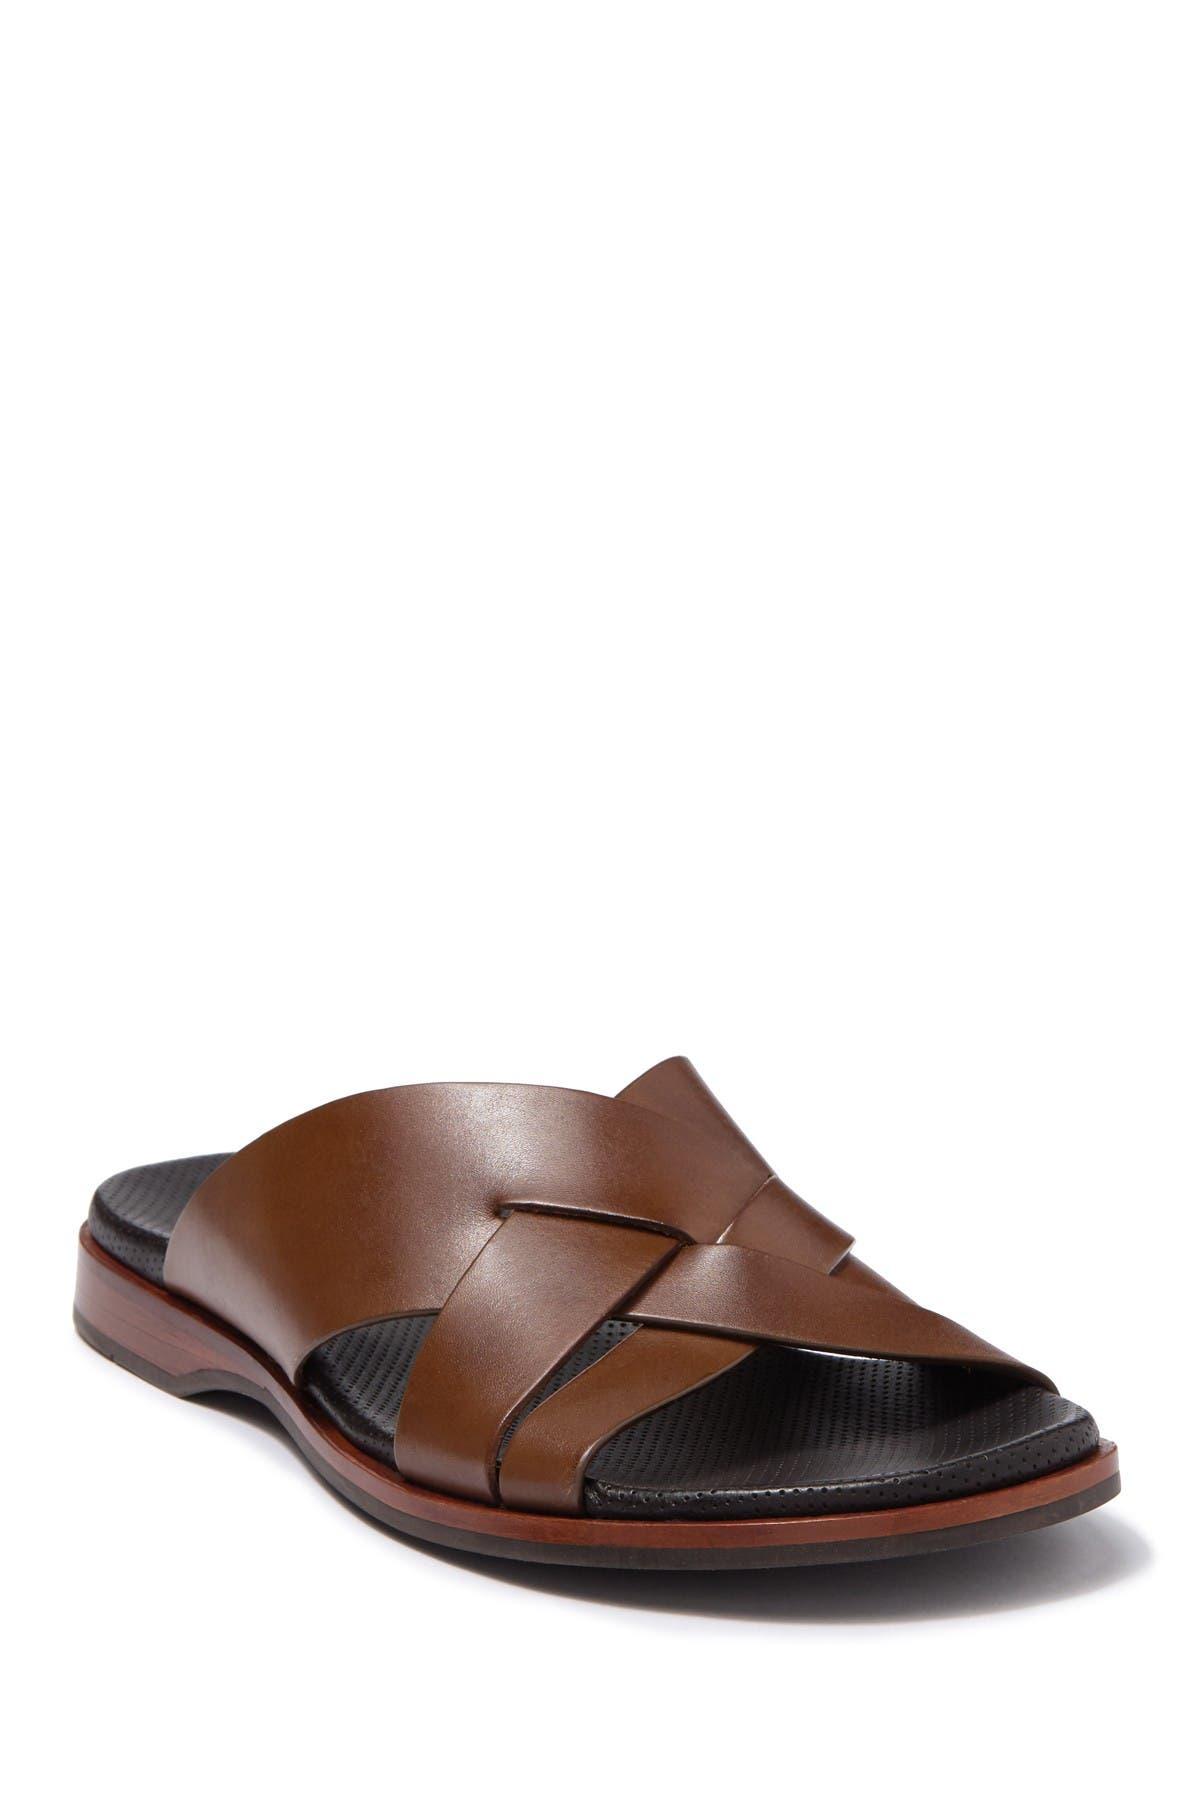 Cole Haan   Goldwyn 2.0 Leather Sandal